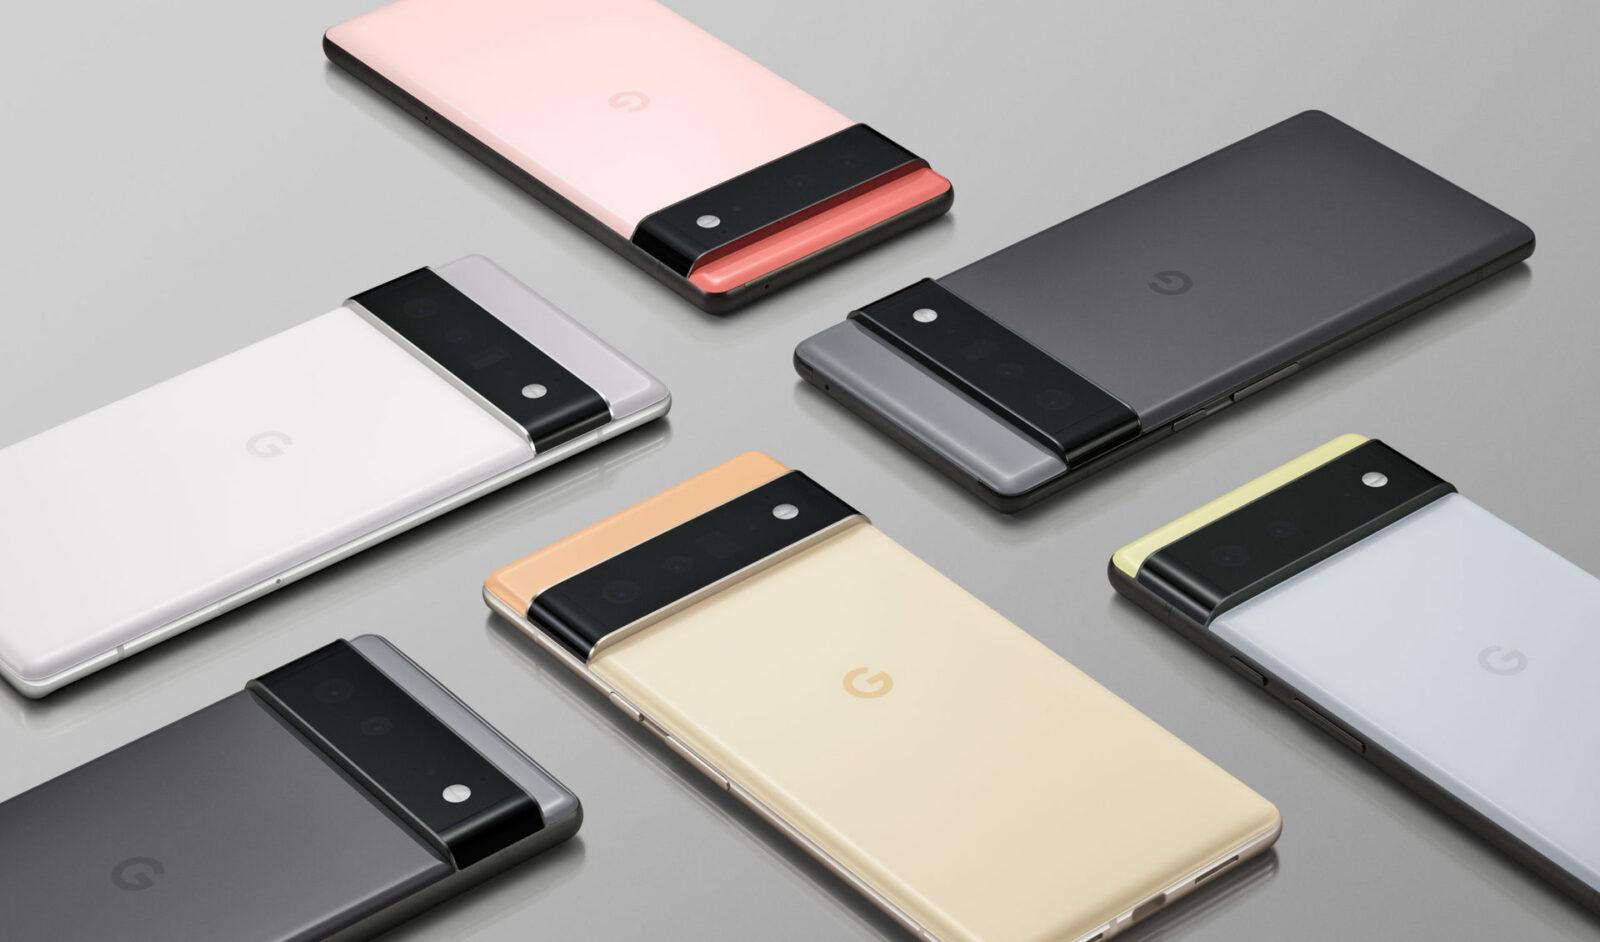 Google готовит второй складной смартфон согласно данным по Android 12 (google pixel 6 pro range scaled 1 large large large)